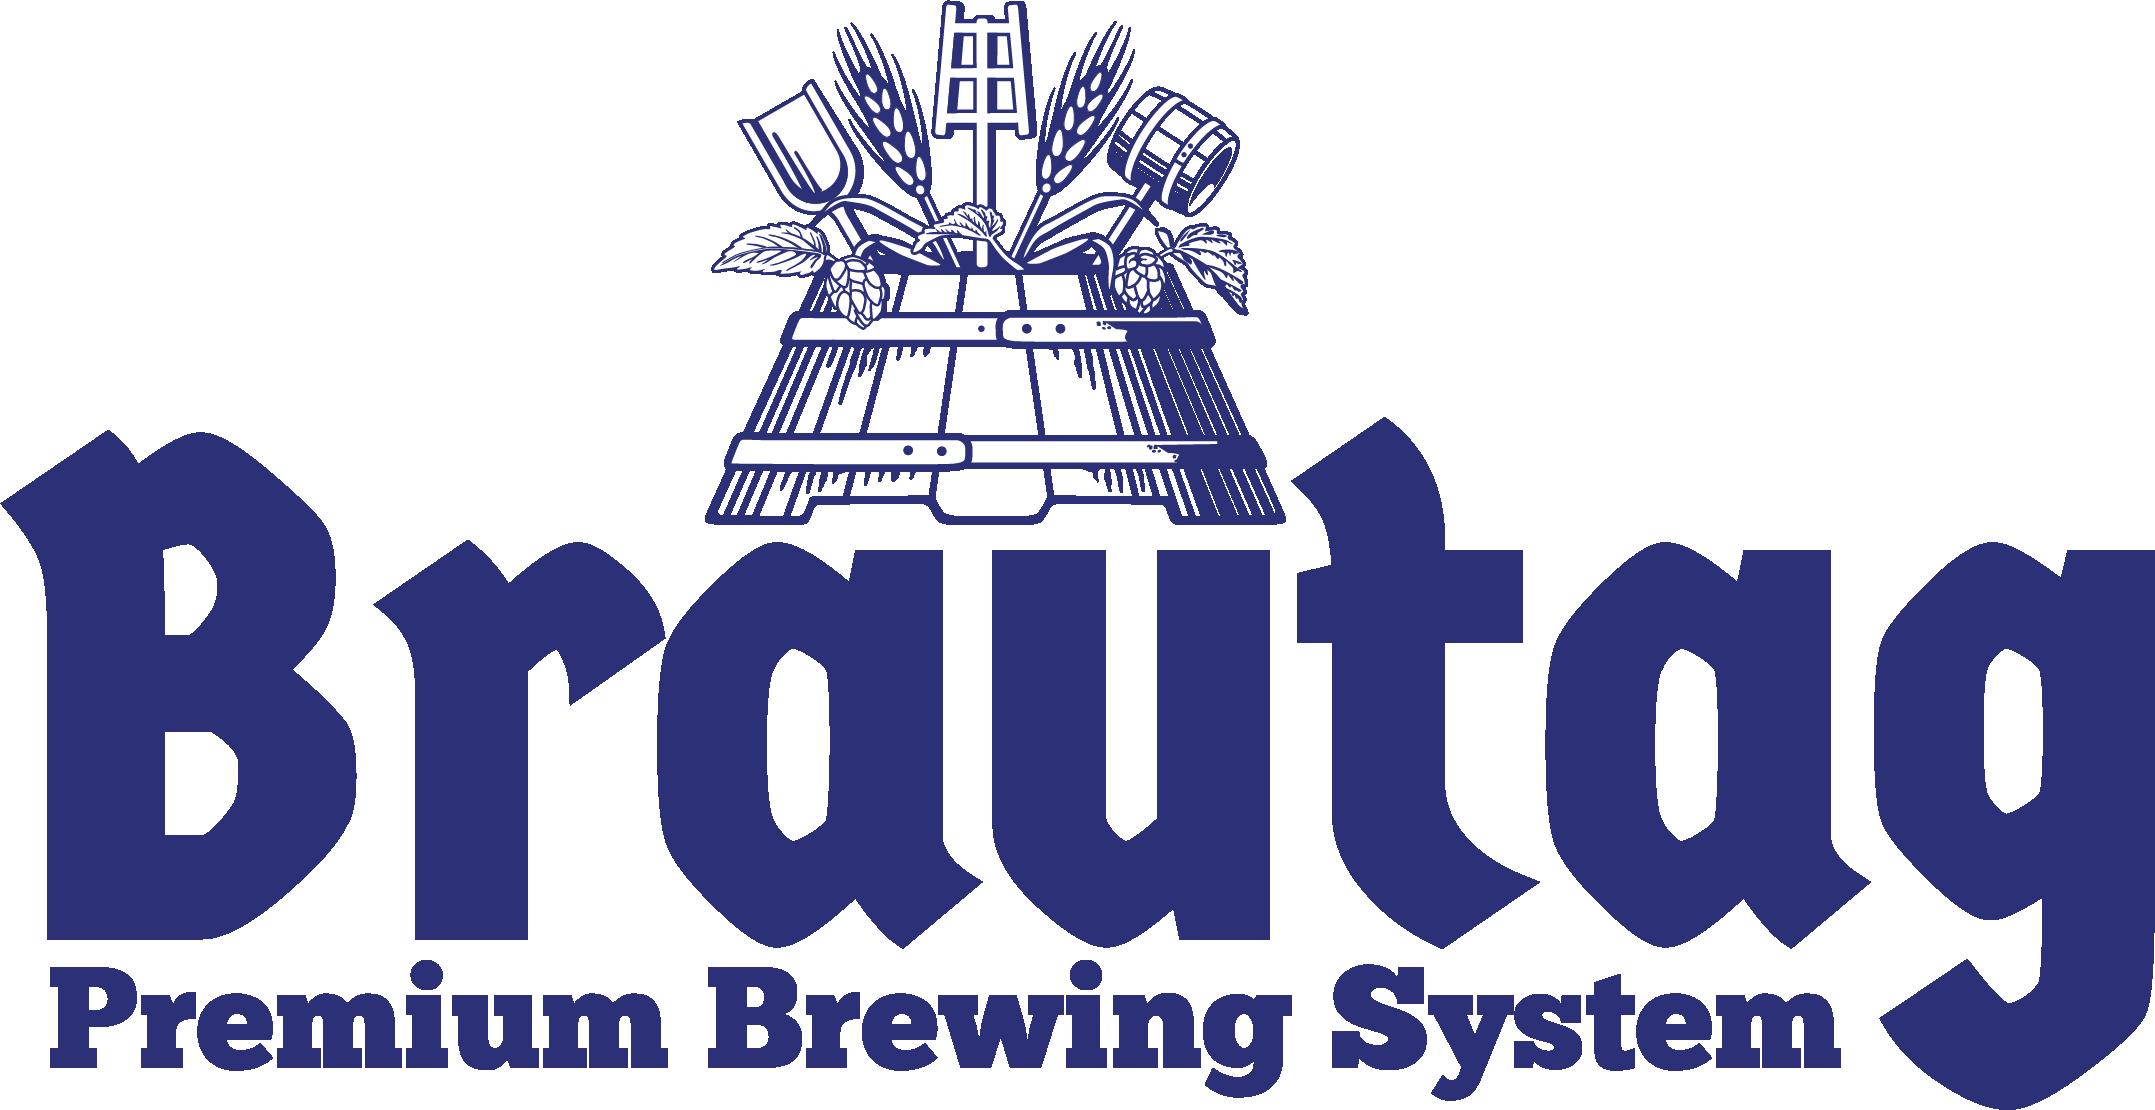 brautag-logo.png